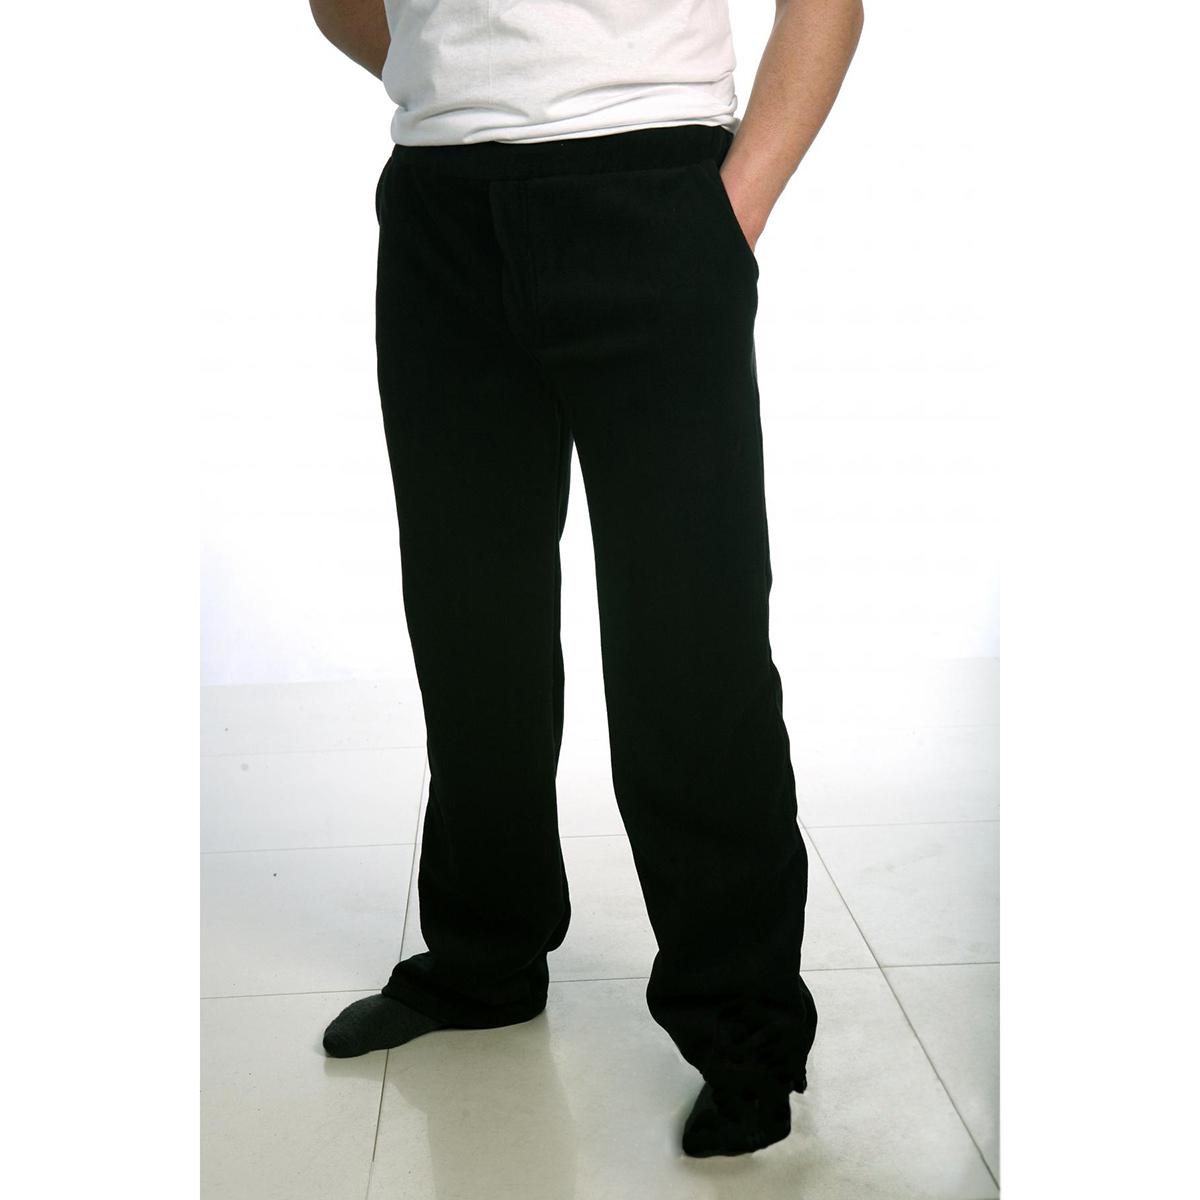 Мужские брюки  Терм , размер 56 - Мужская одежда артикул: 16175